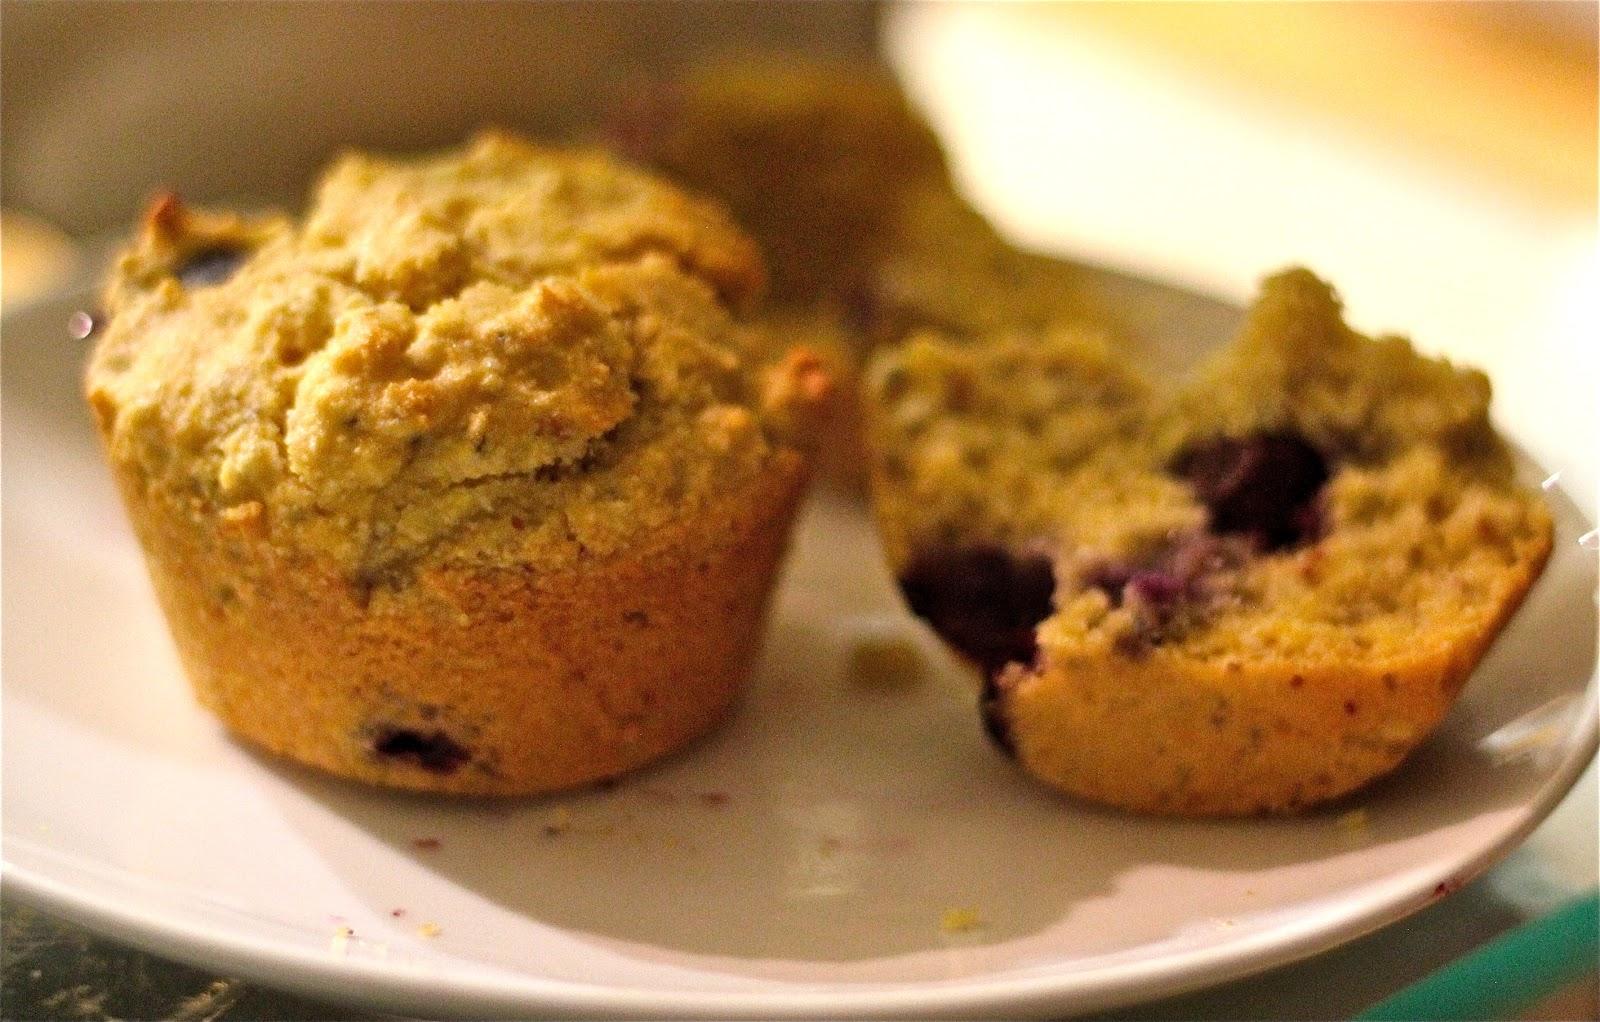 picnic bakery: Gluten-Free Blueberry Corn Muffins